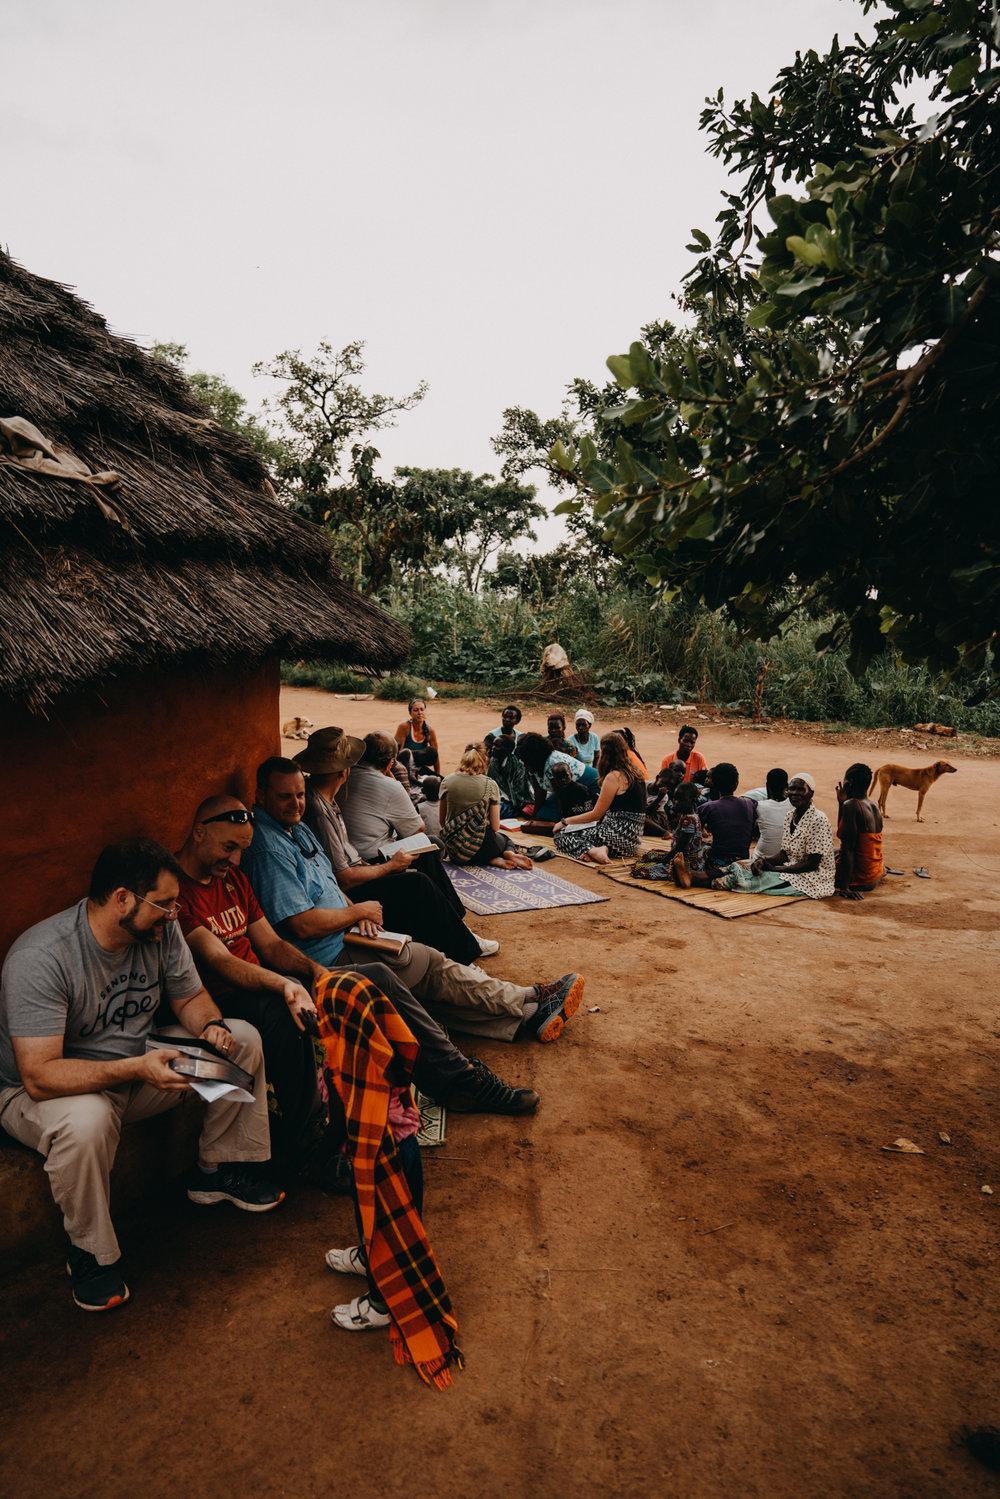 uganda july 2018-6.jpg